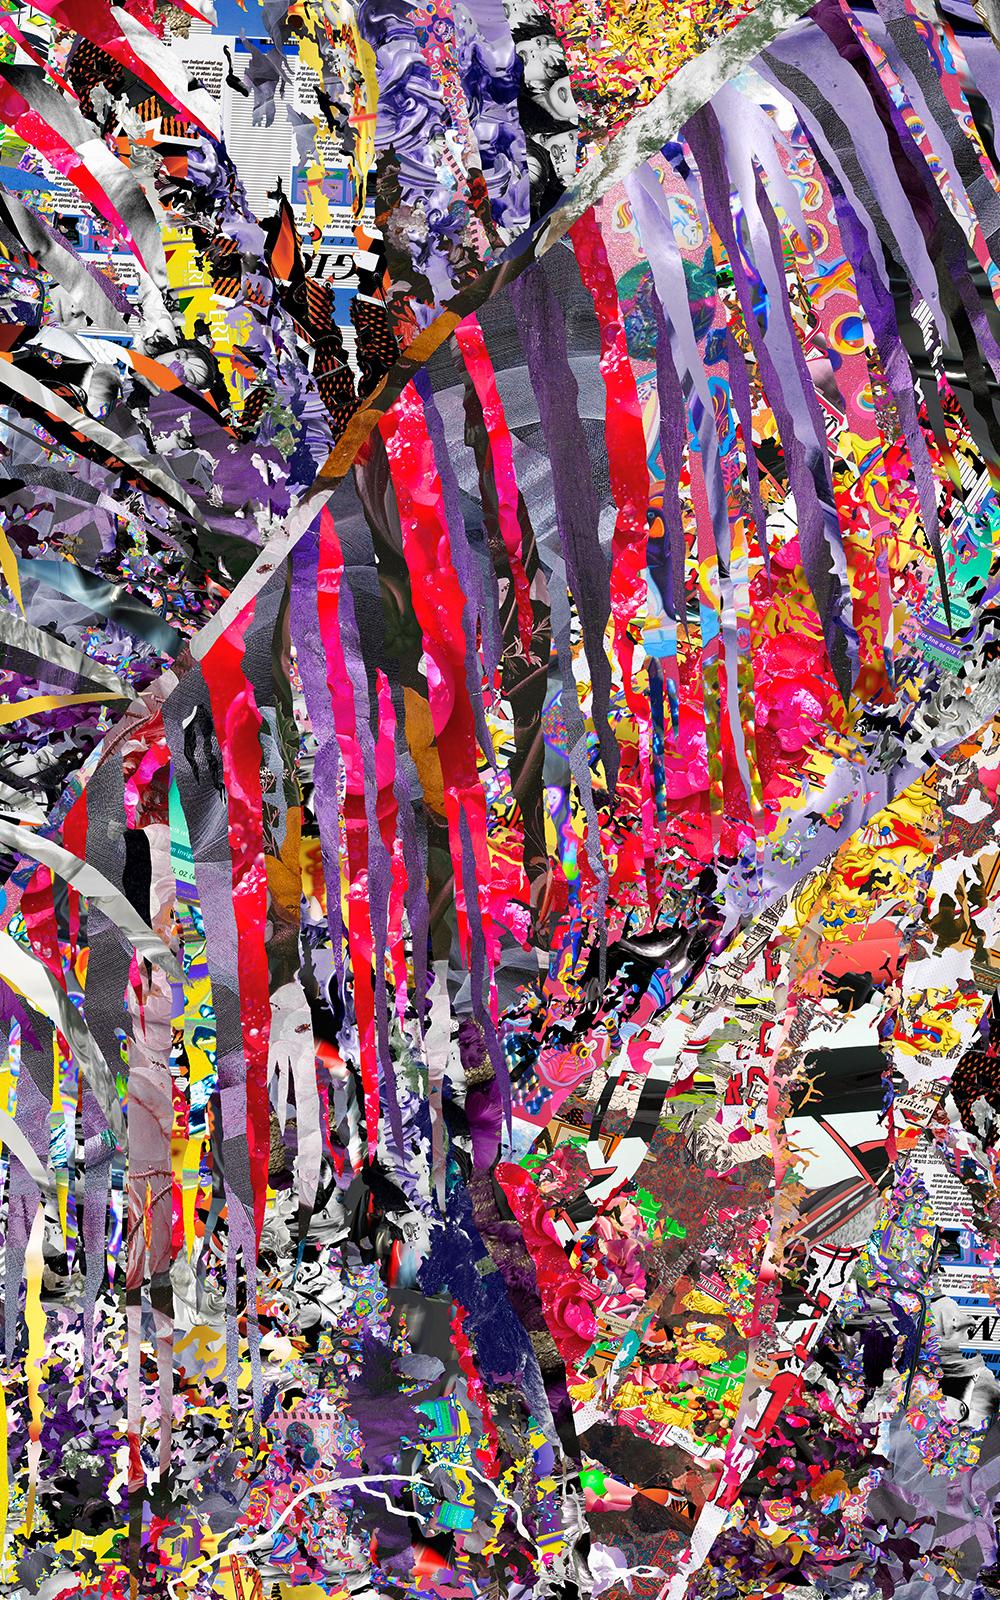 Case Simmons, Simmons & Burke, Tropical Passion, Dutchmasters, Kohn Gallery,Pigment Print, Digital Collage,Digital Art, Photoshop Collage, Contemporary Collage, Photoshop Actions, Case Simmons Art, Collage Fine Art, Digital Landscape